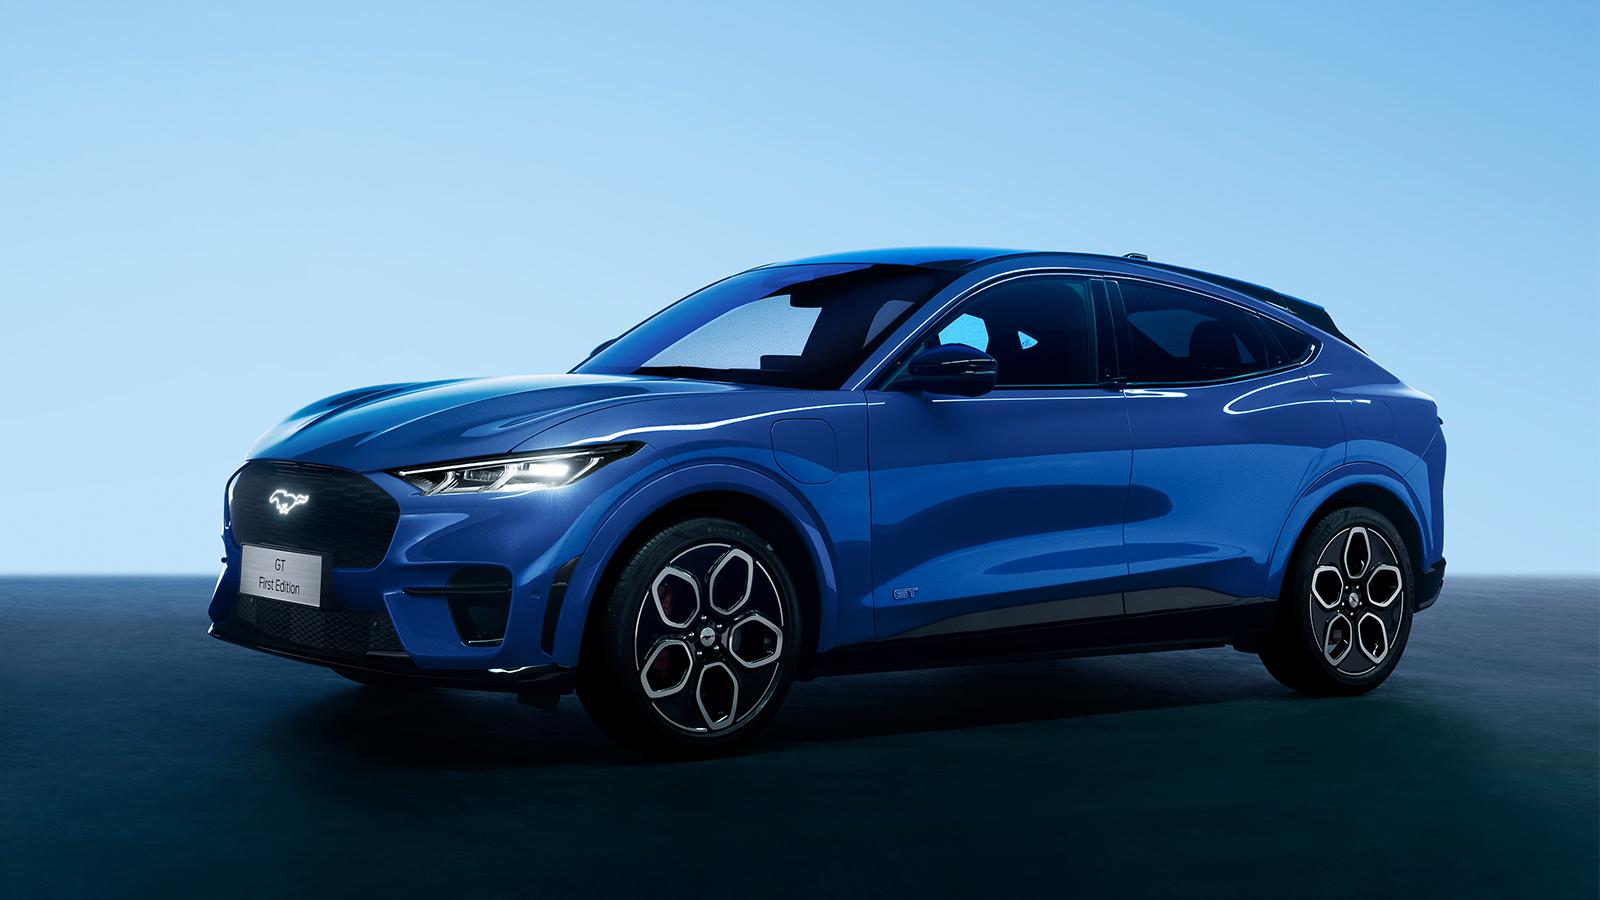 Mustang Mach-E所有智能辅助驾驶硬件前装,打造可进化的智能汽车